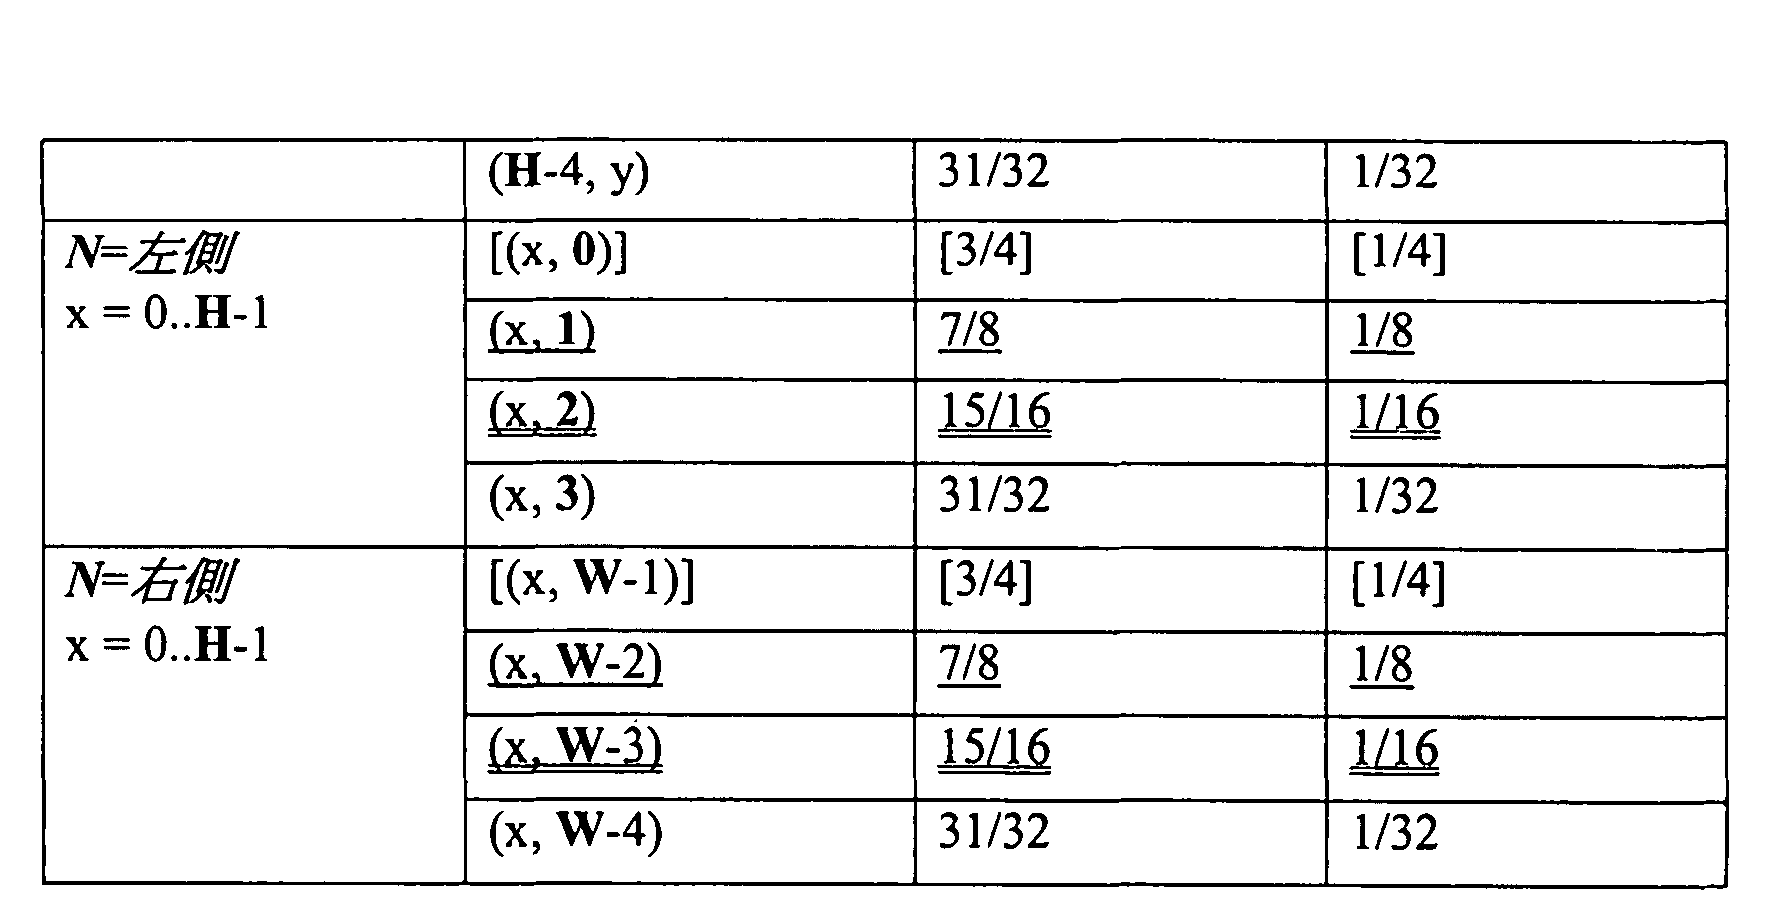 Figure 105102384-A0202-12-0037-2